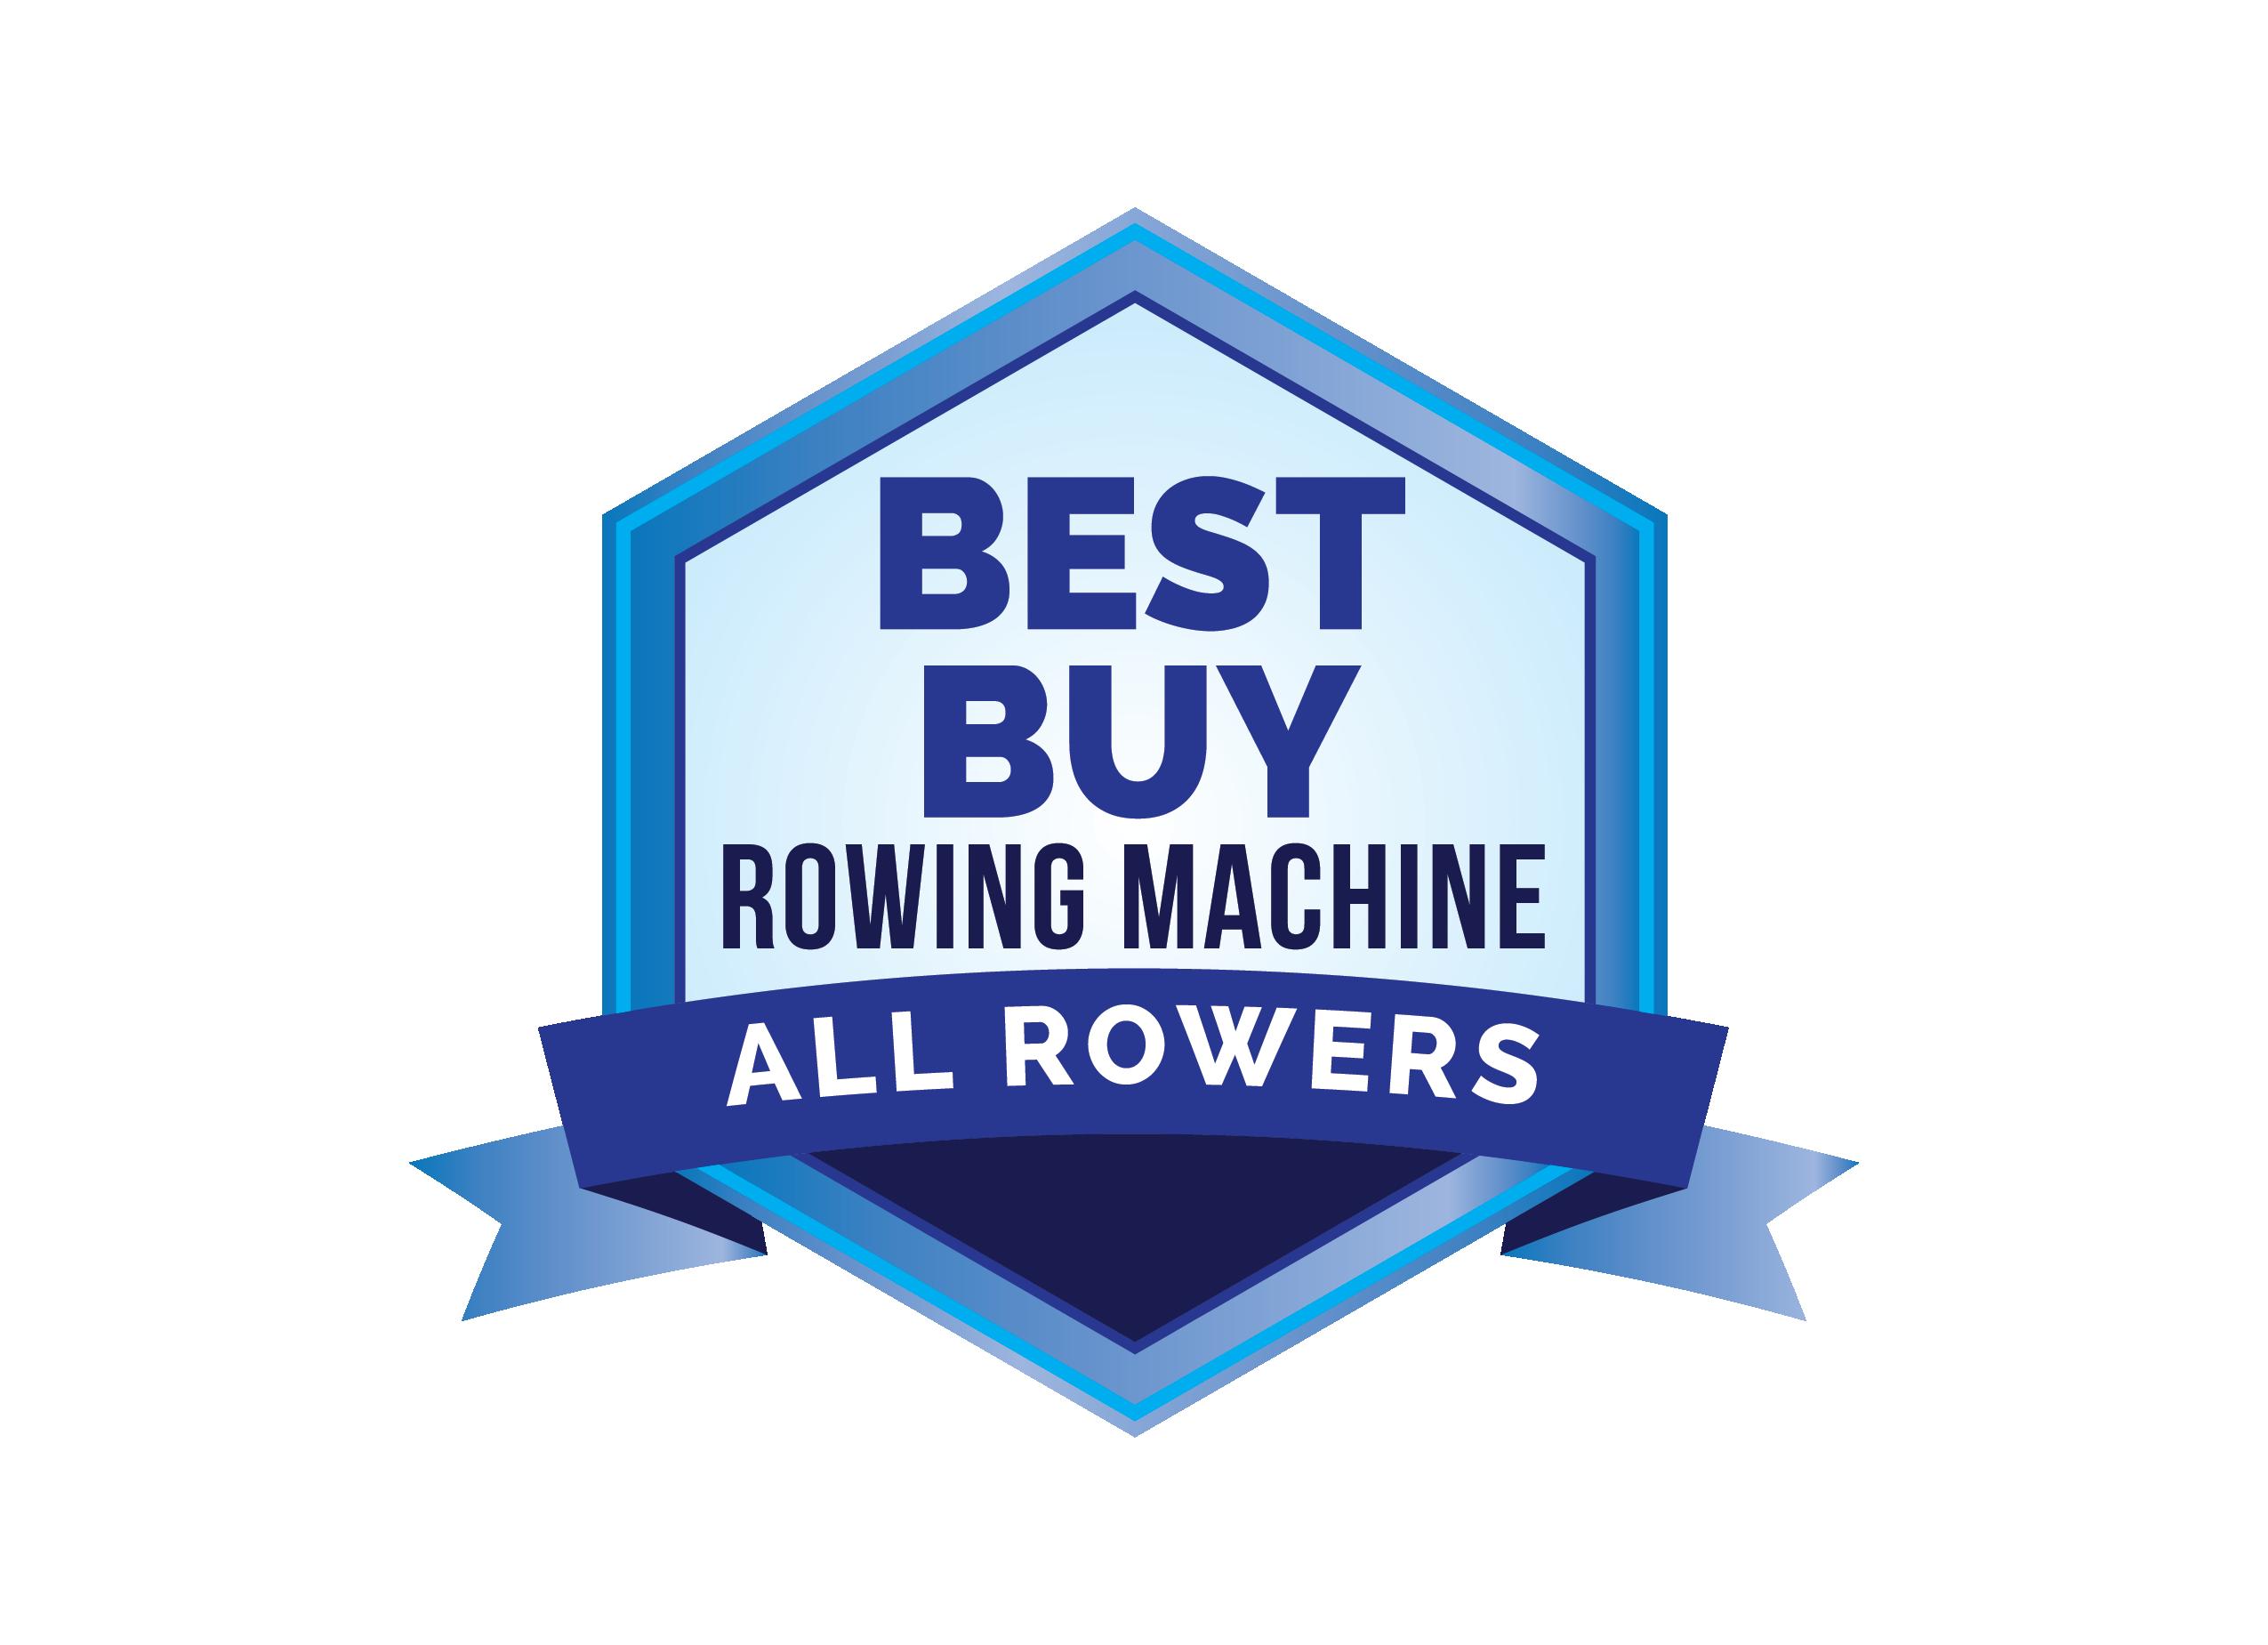 All Rowers Best Buy Rowing Machines